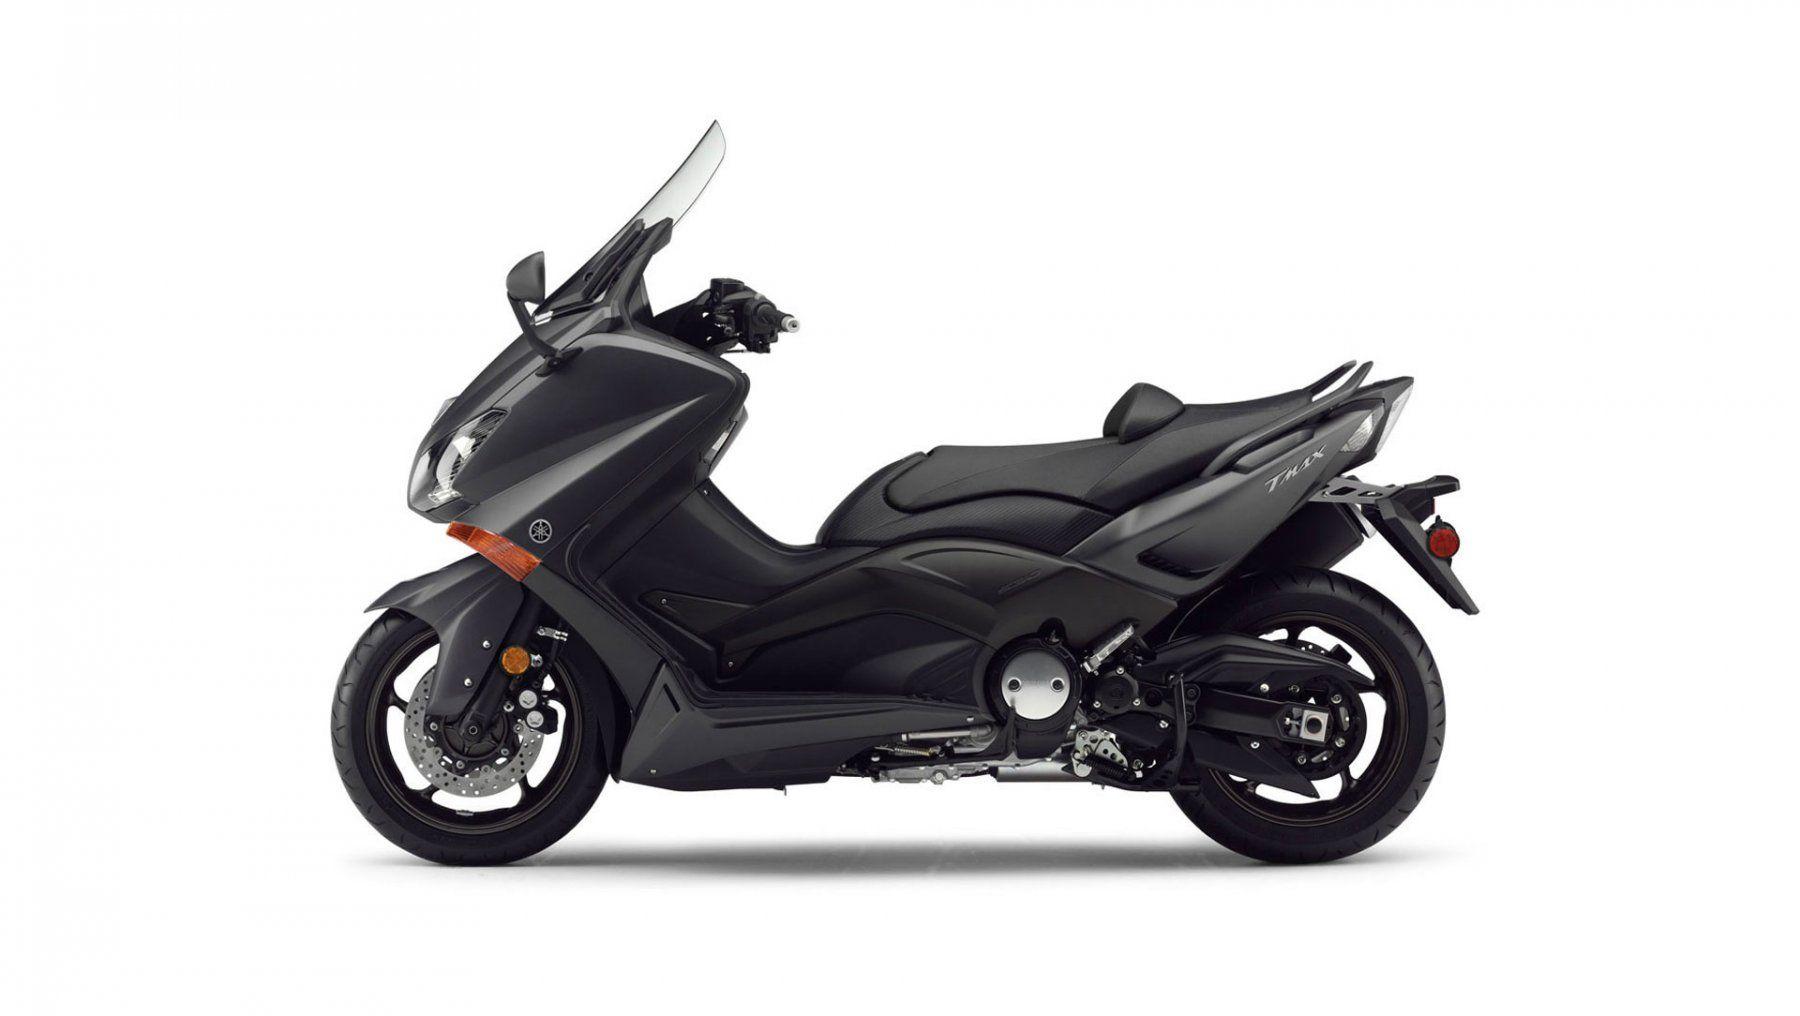 yamaha tmax 530 video officielle de pr sentation mod le 2013 moto scooter marseille. Black Bedroom Furniture Sets. Home Design Ideas